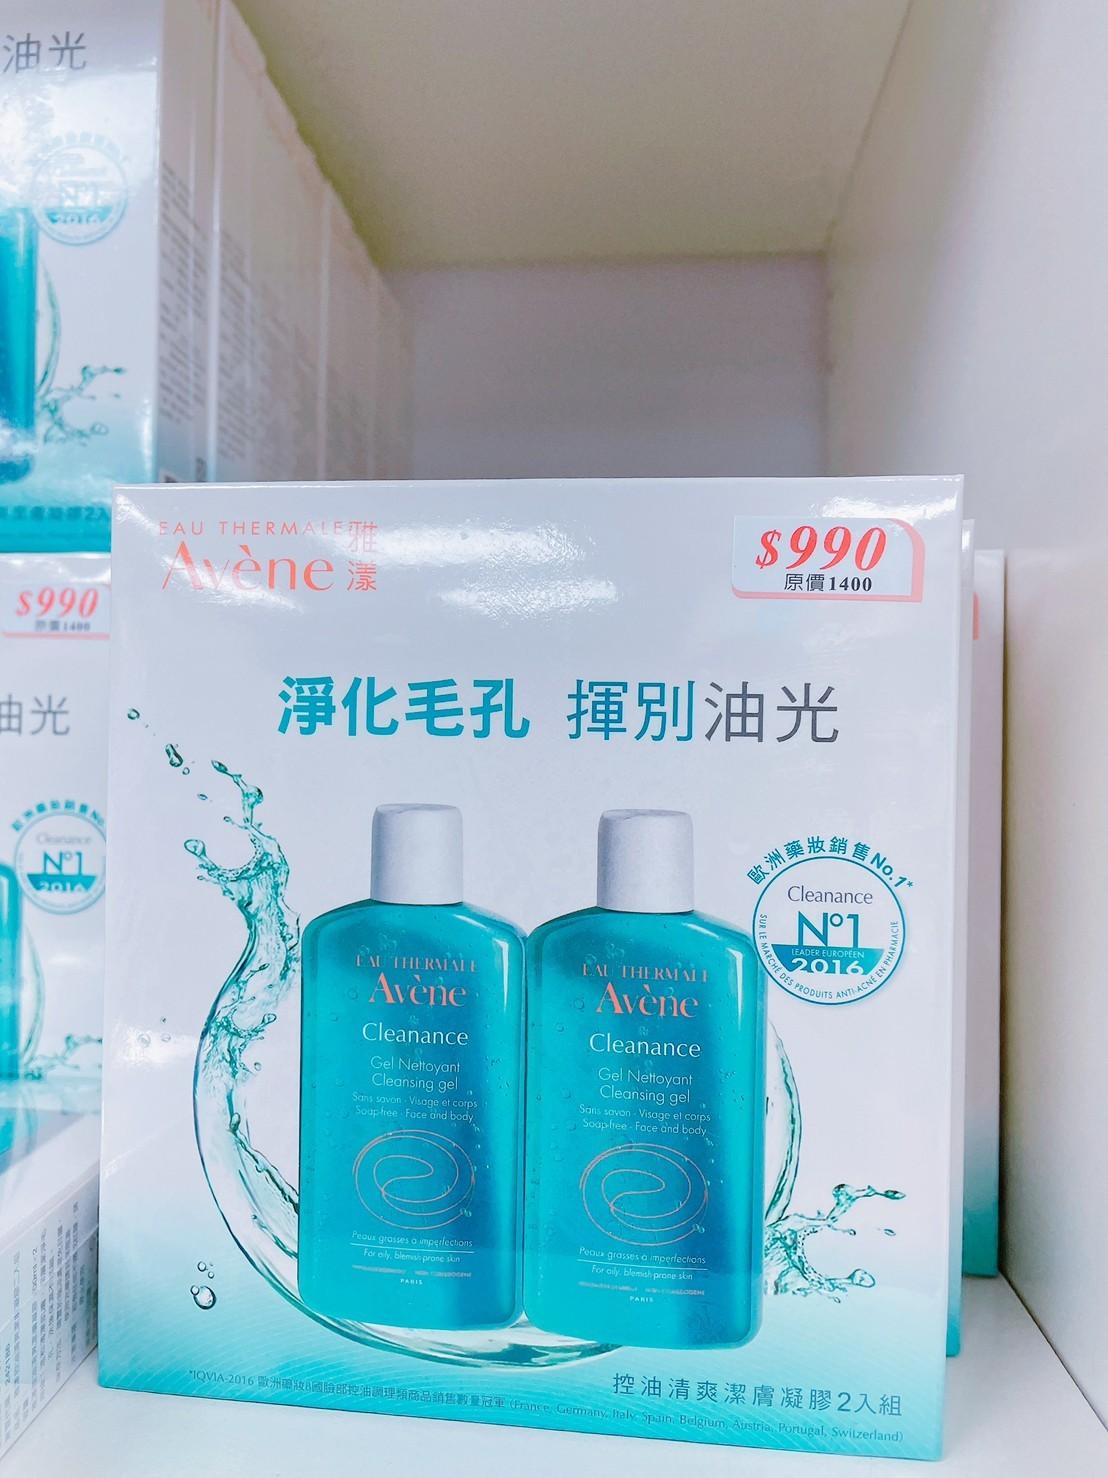 【FIFI】Avene 雅漾 控油清爽潔膚凝膠 升級版 200ml